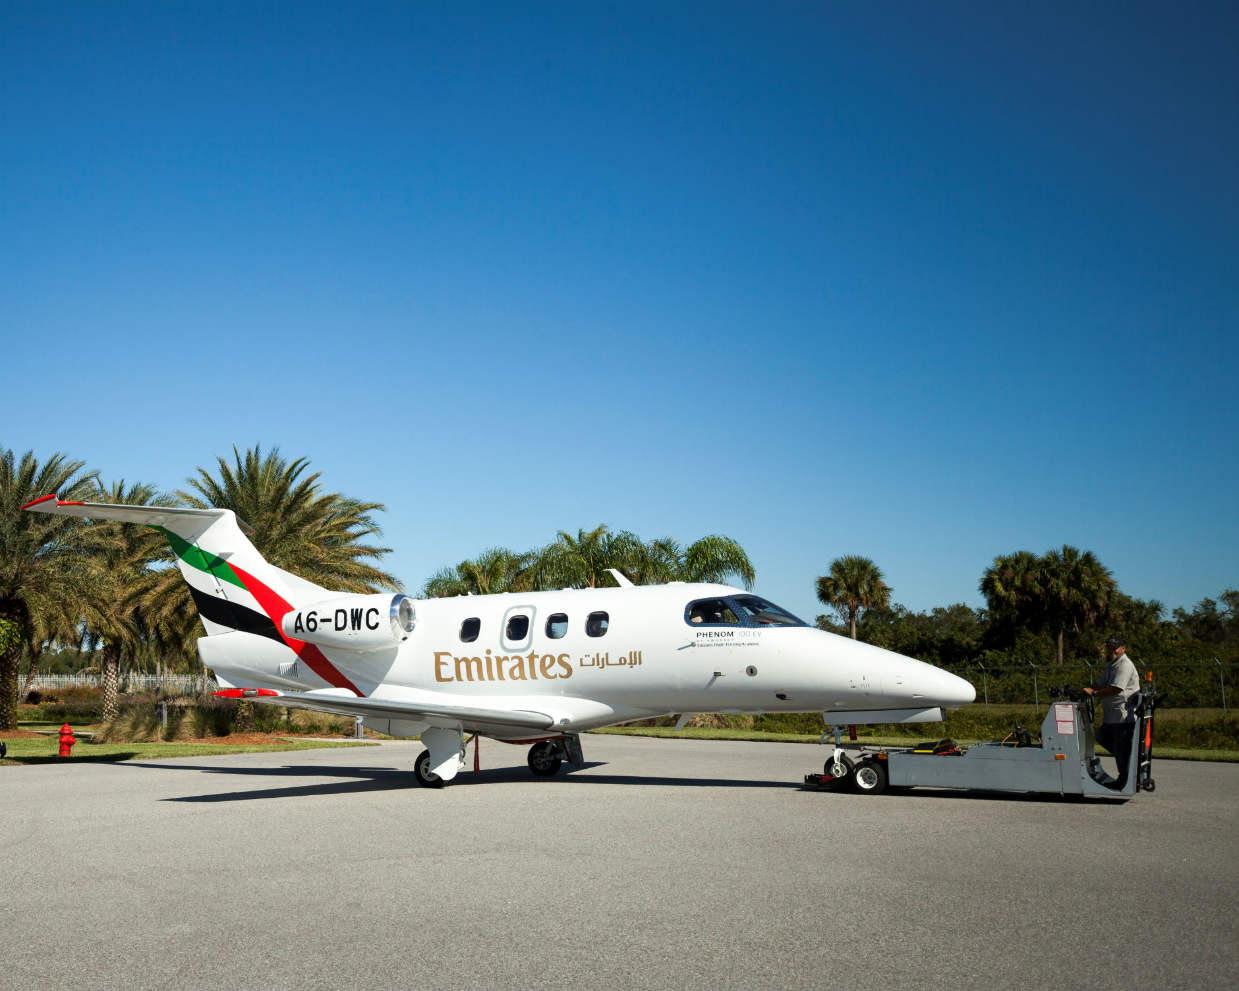 Emirates Flight Training Academy gets first Embraer Phenom 100EV